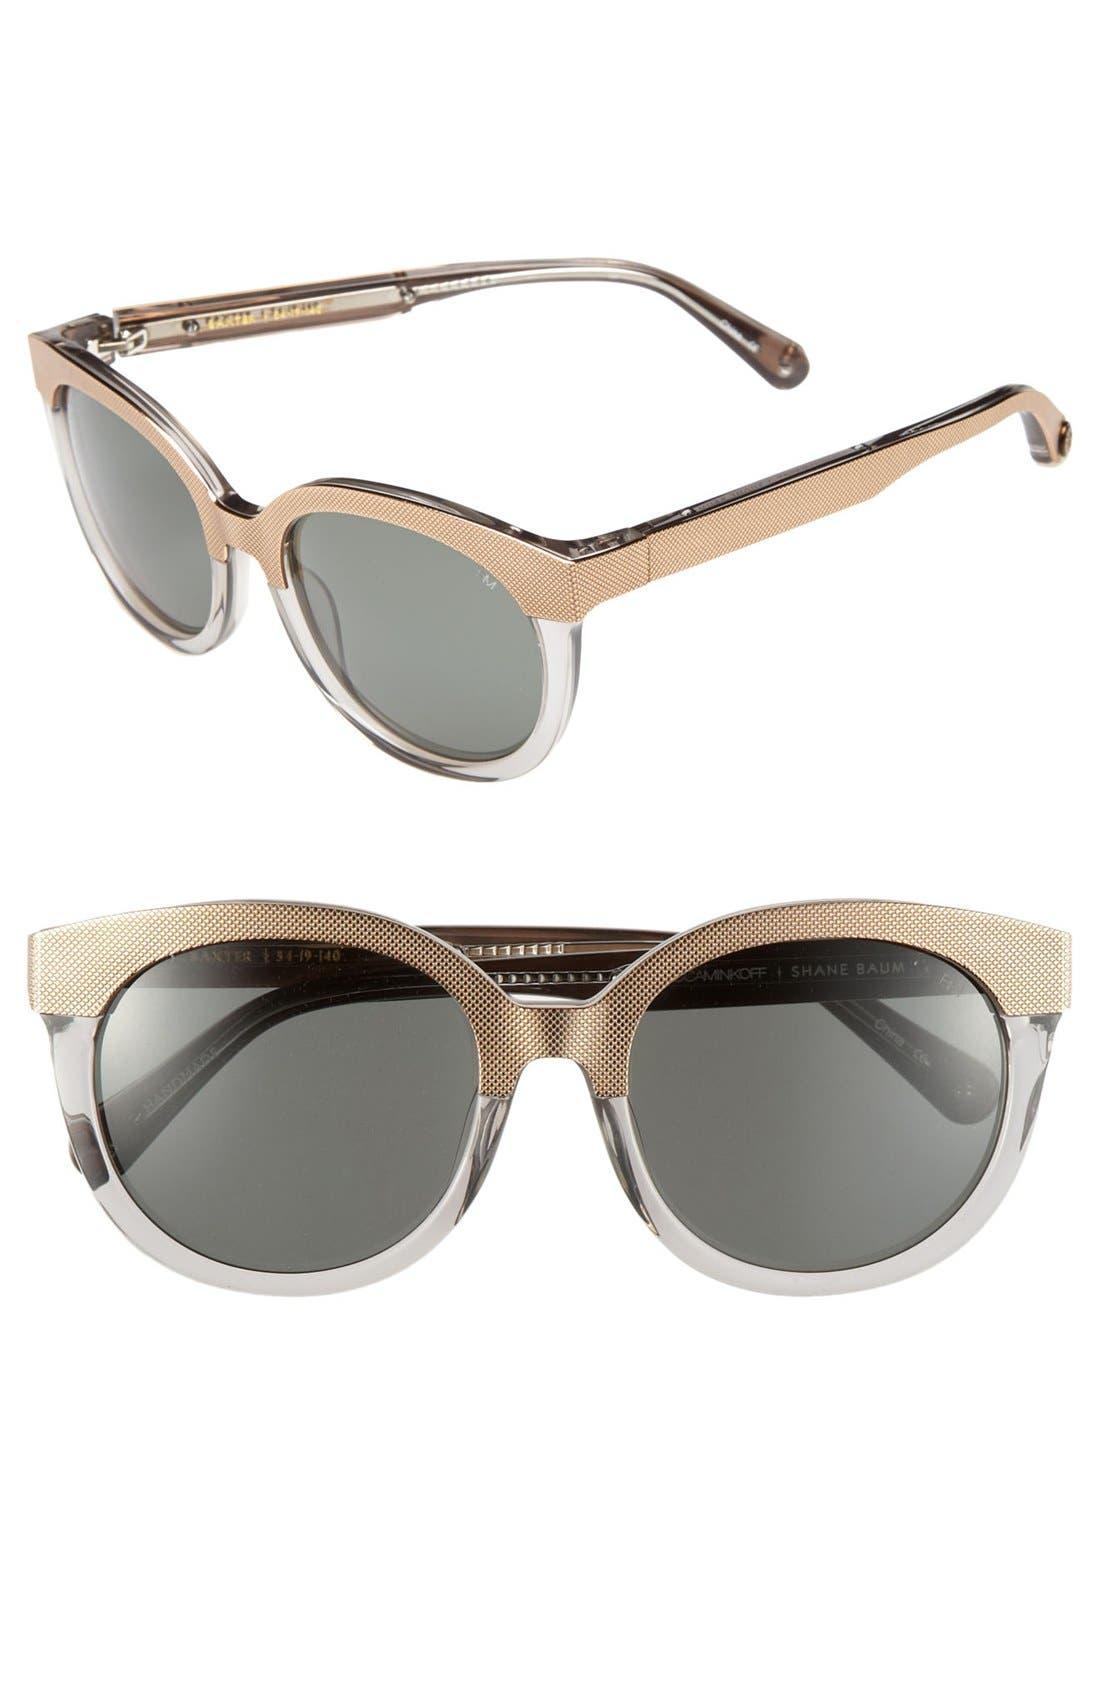 Alternate Image 1 Selected - Rebecca Minkoff 'Baxter' Sunglasses